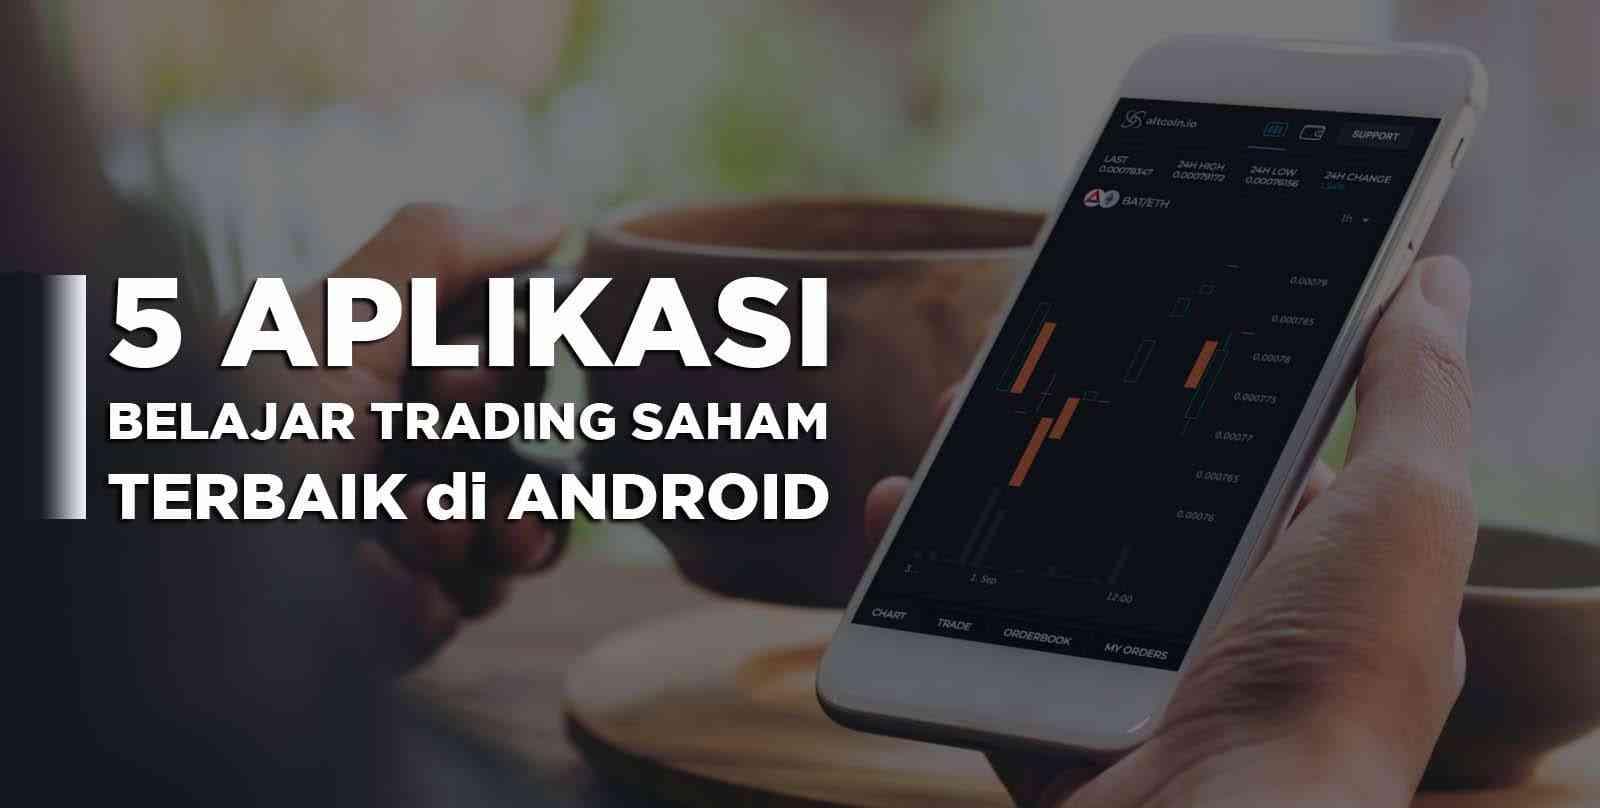 aplikasi simulasi trading saham terbaik di Android untuk Pemula